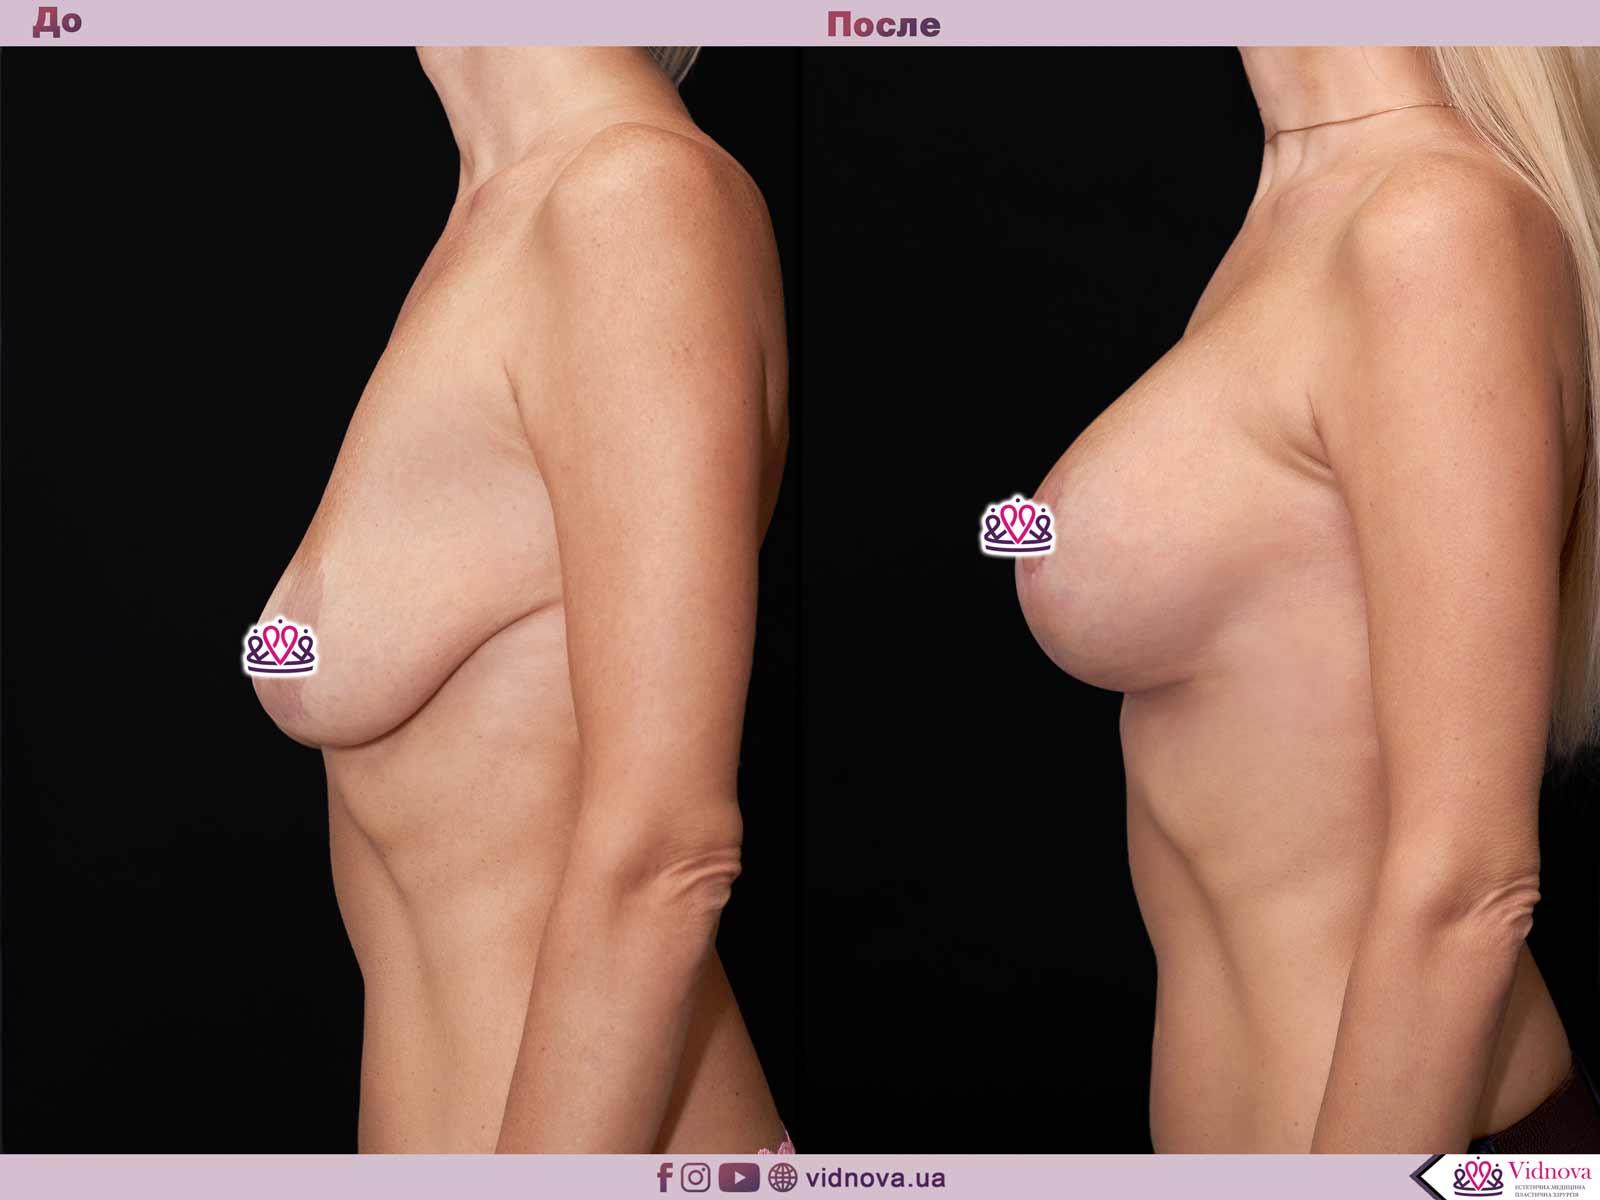 Подтяжка груди: Фото ДО и ПОСЛЕ - Пример №20-3 - Клиника Vidnova